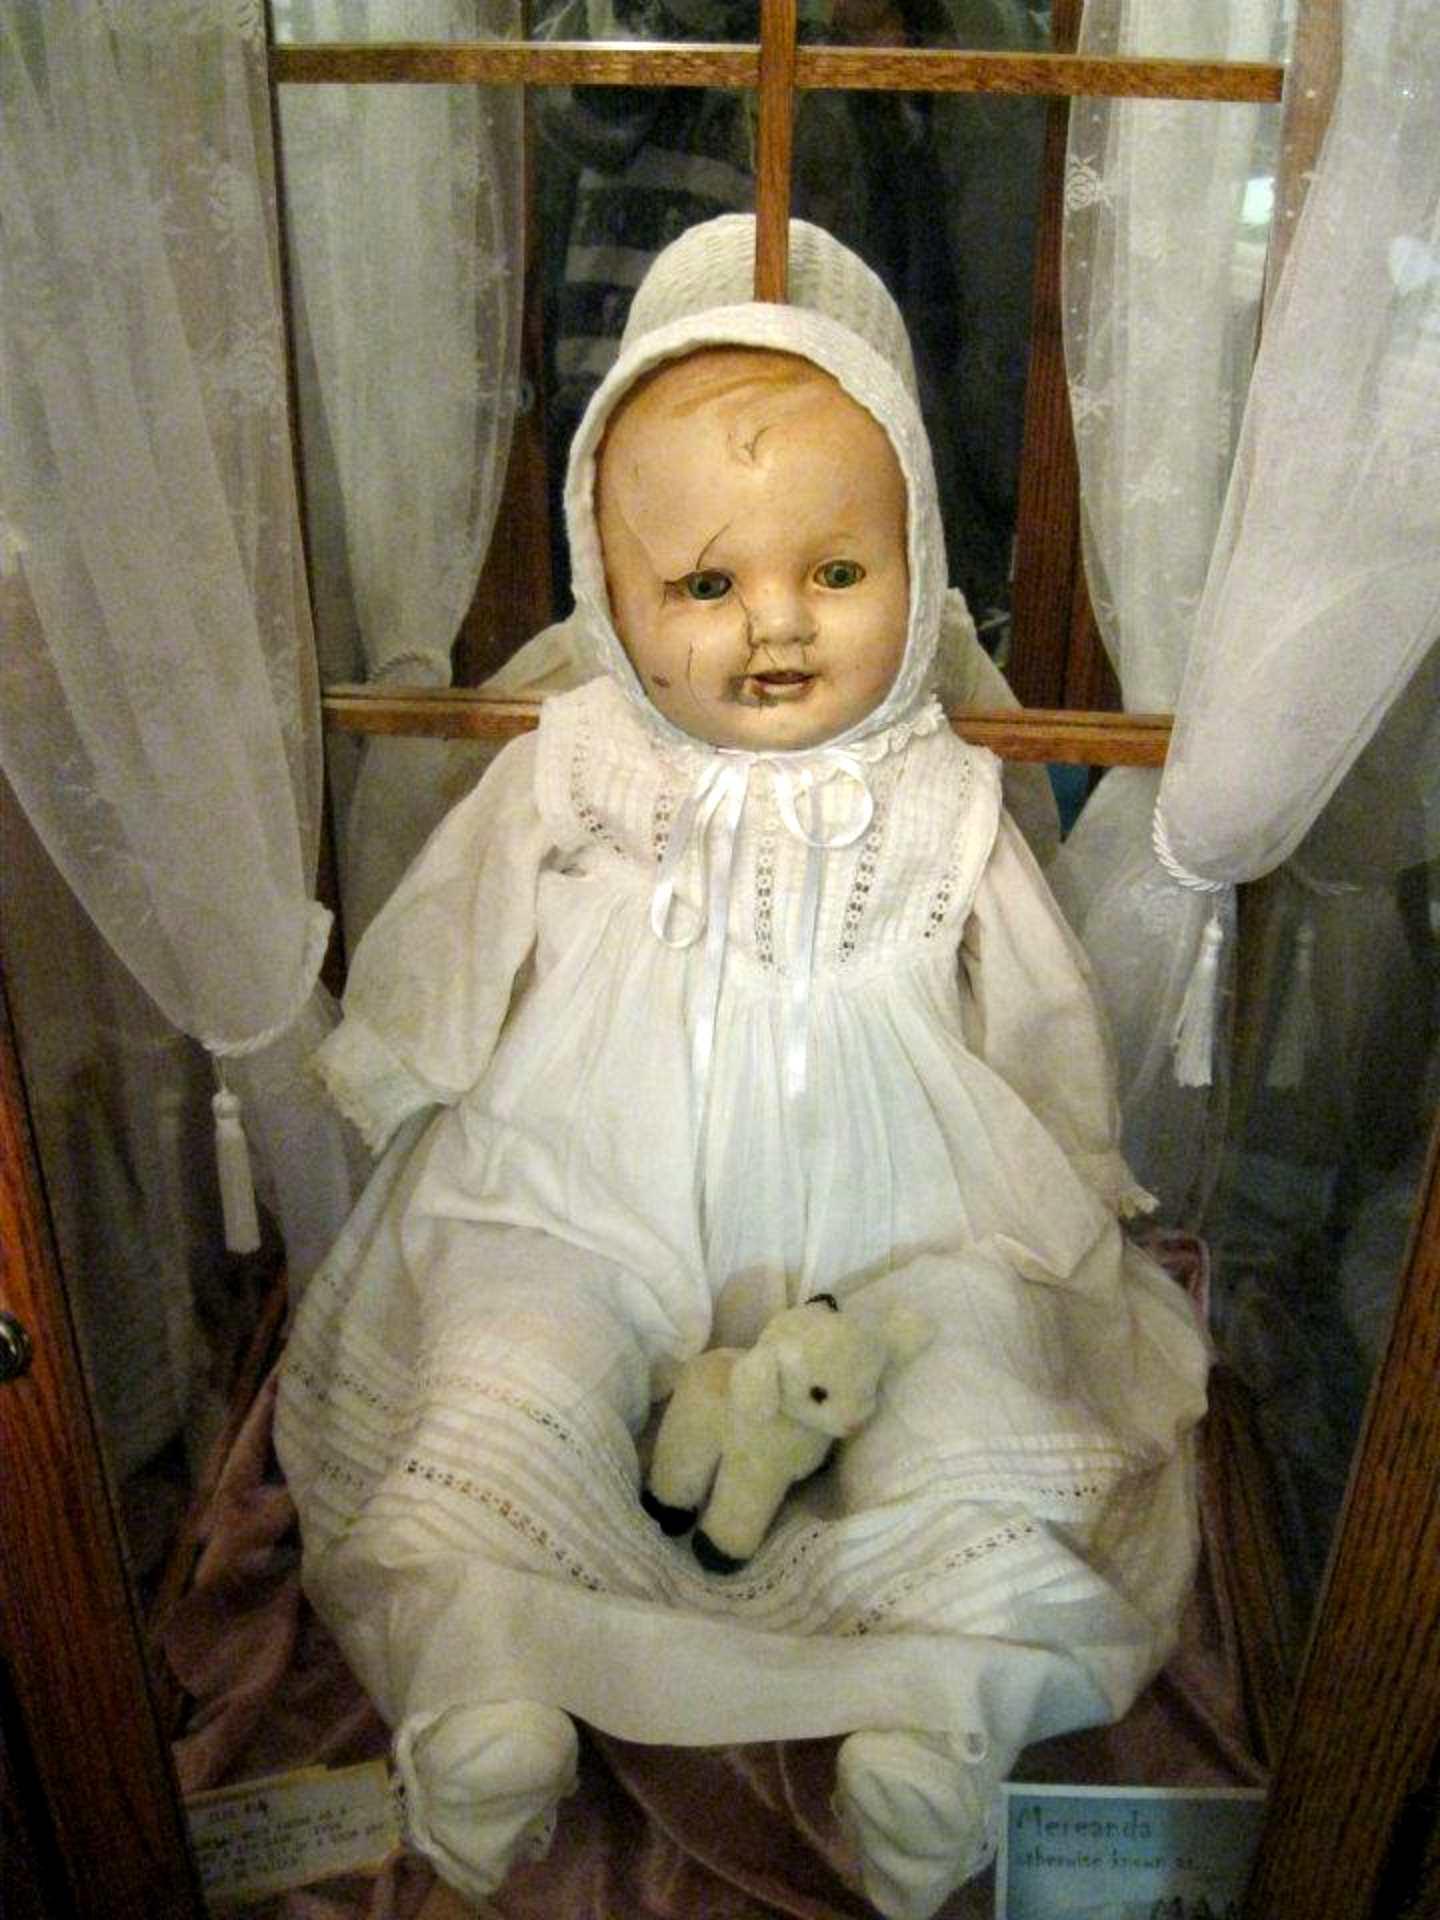 Mandy the Doll, England